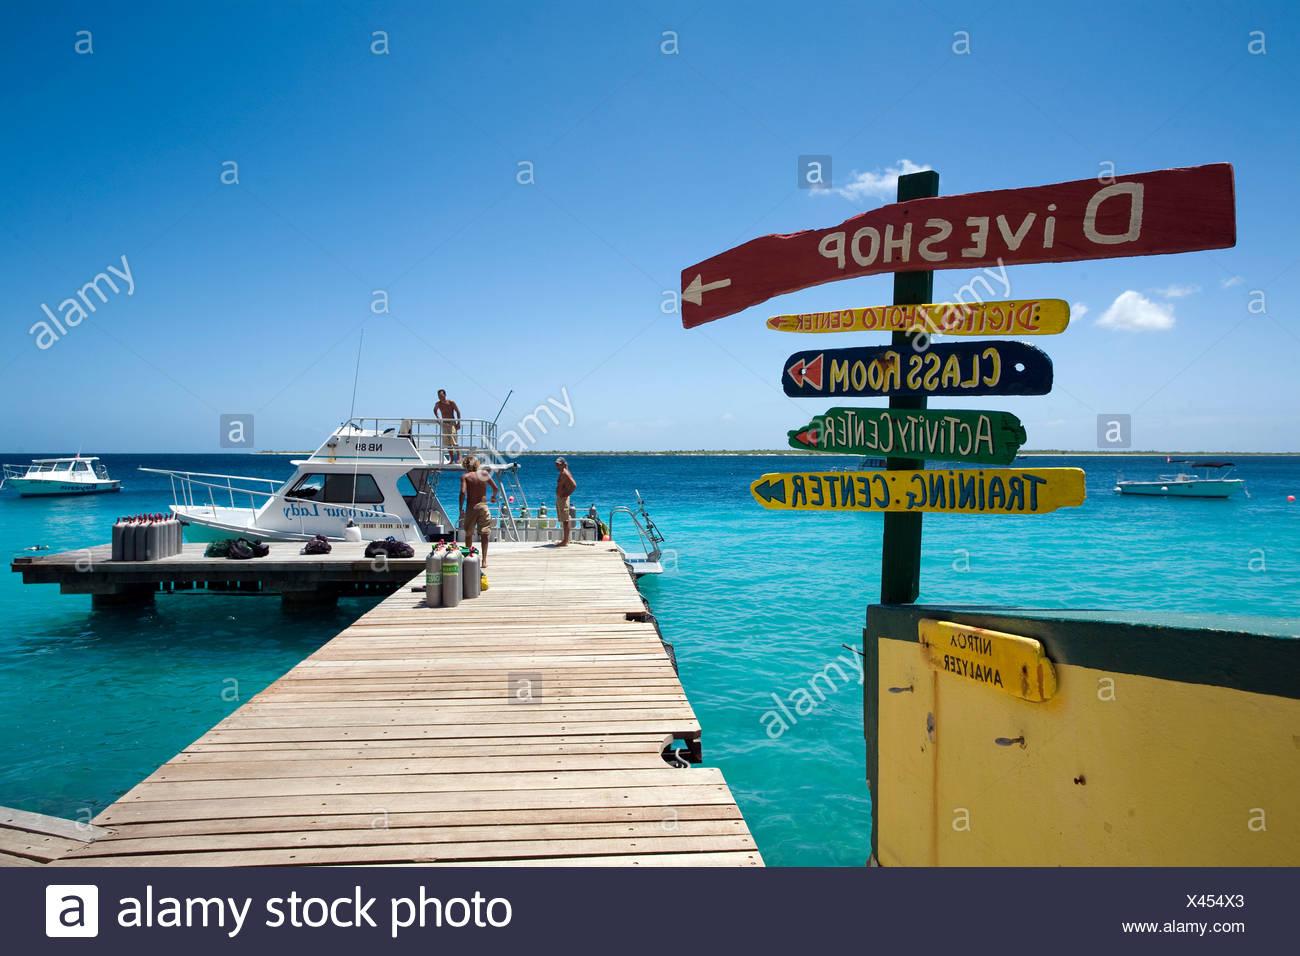 Jetty, Buddy Dive Resort, a popular resort and hotel for divers, Kralendijk, Bonaire, Netherlands Antilles, Antilles, Caribbean - Stock Image